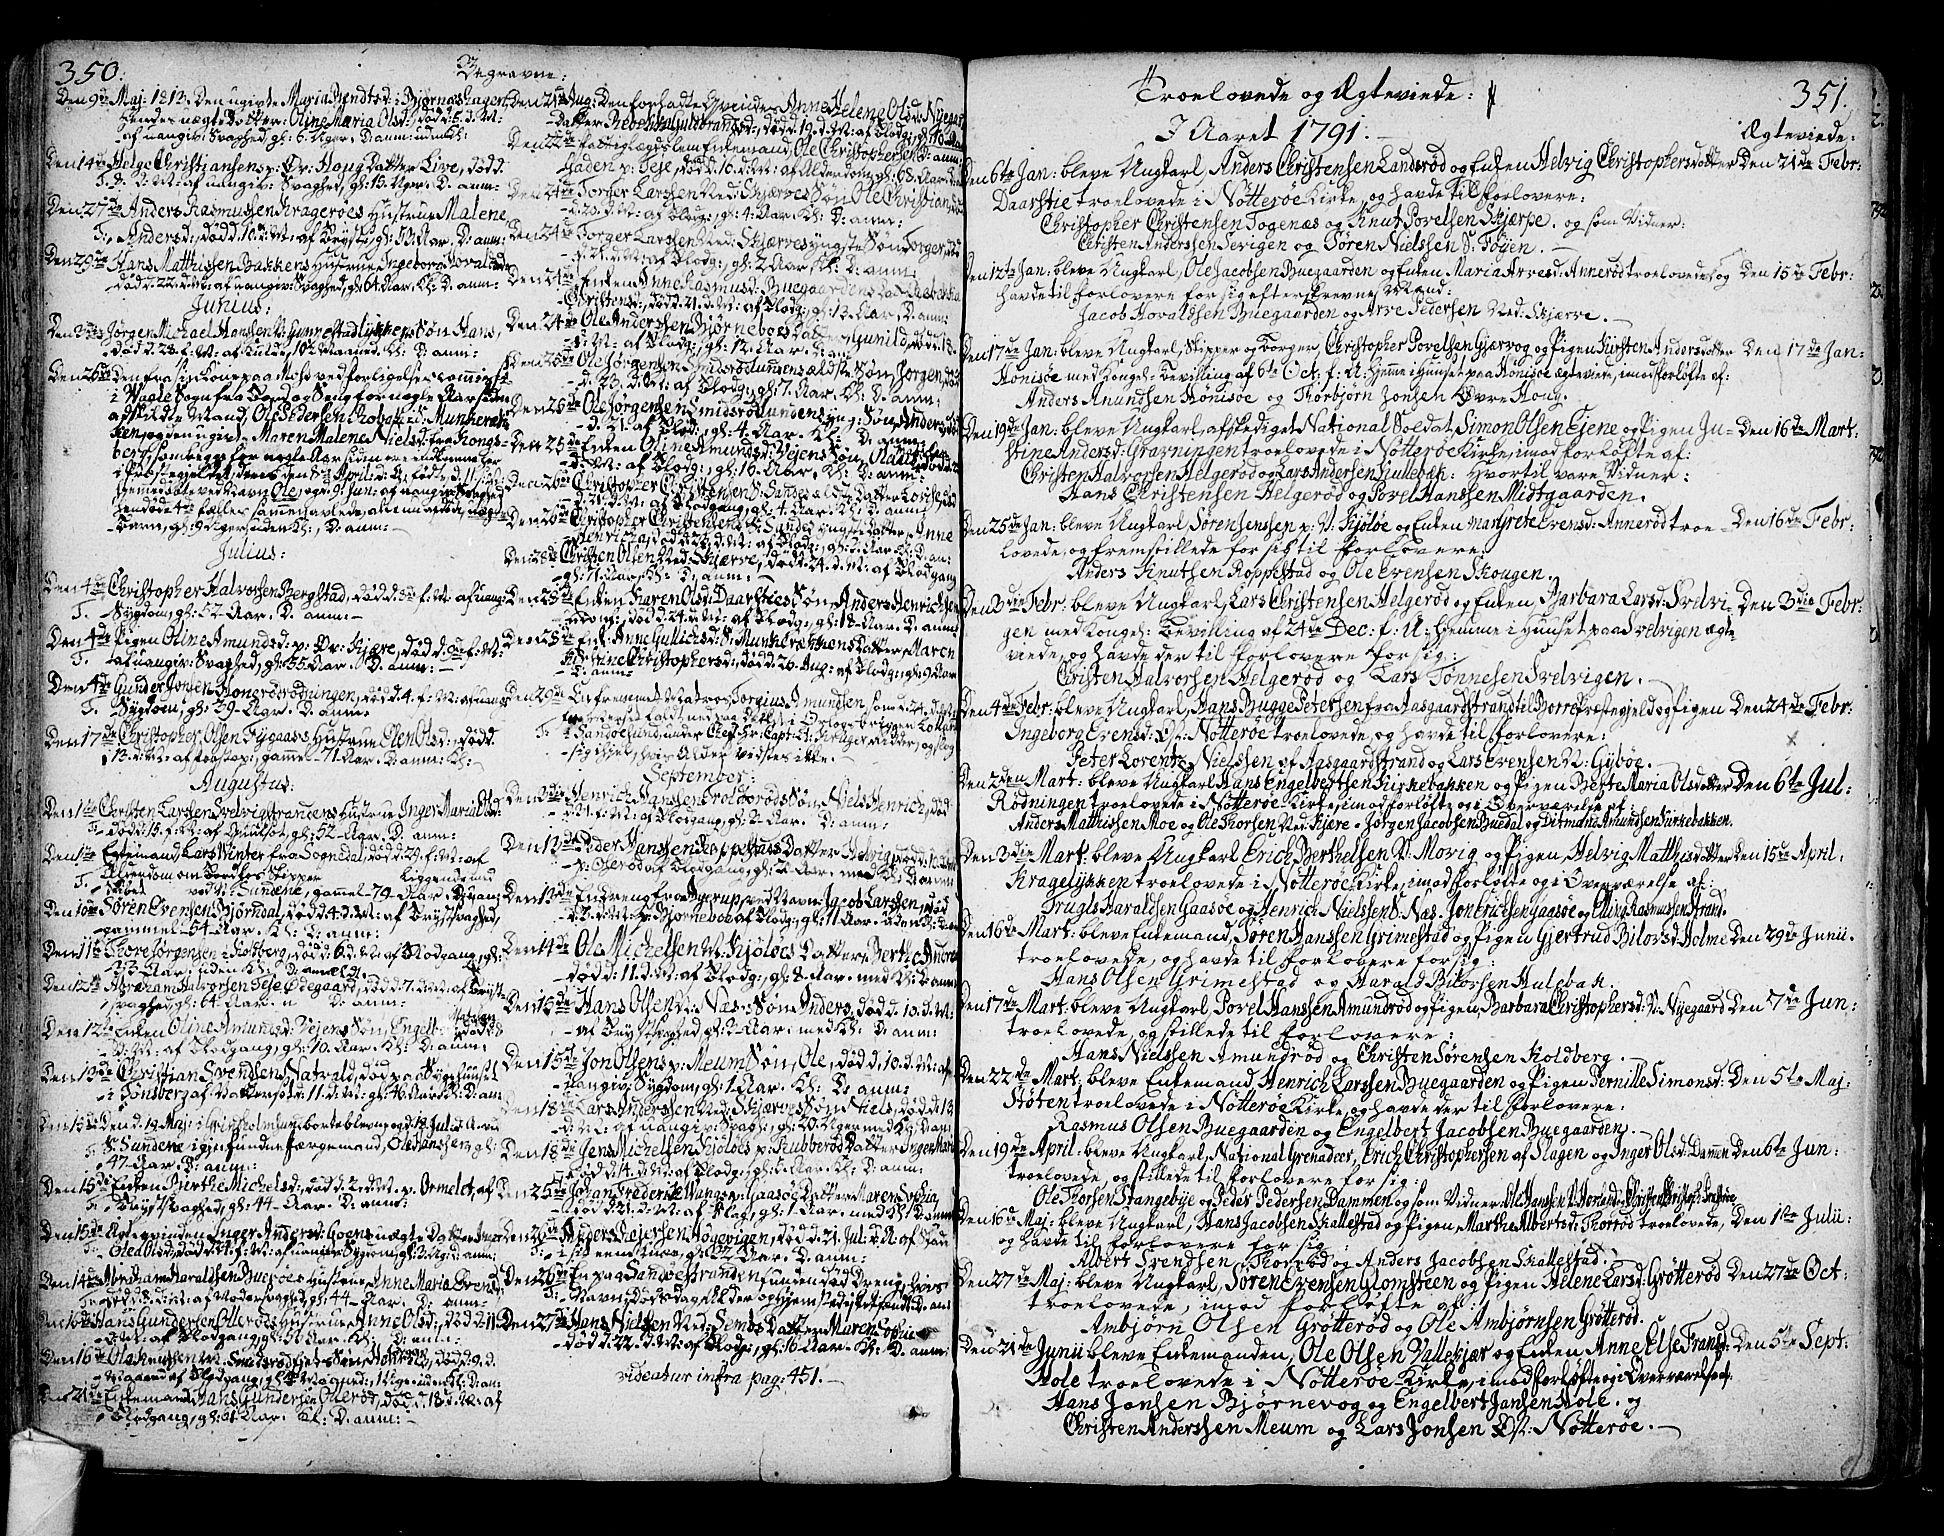 SAKO, Nøtterøy kirkebøker, F/Fa/L0003: Ministerialbok nr. I 3, 1791-1814, s. 350-351